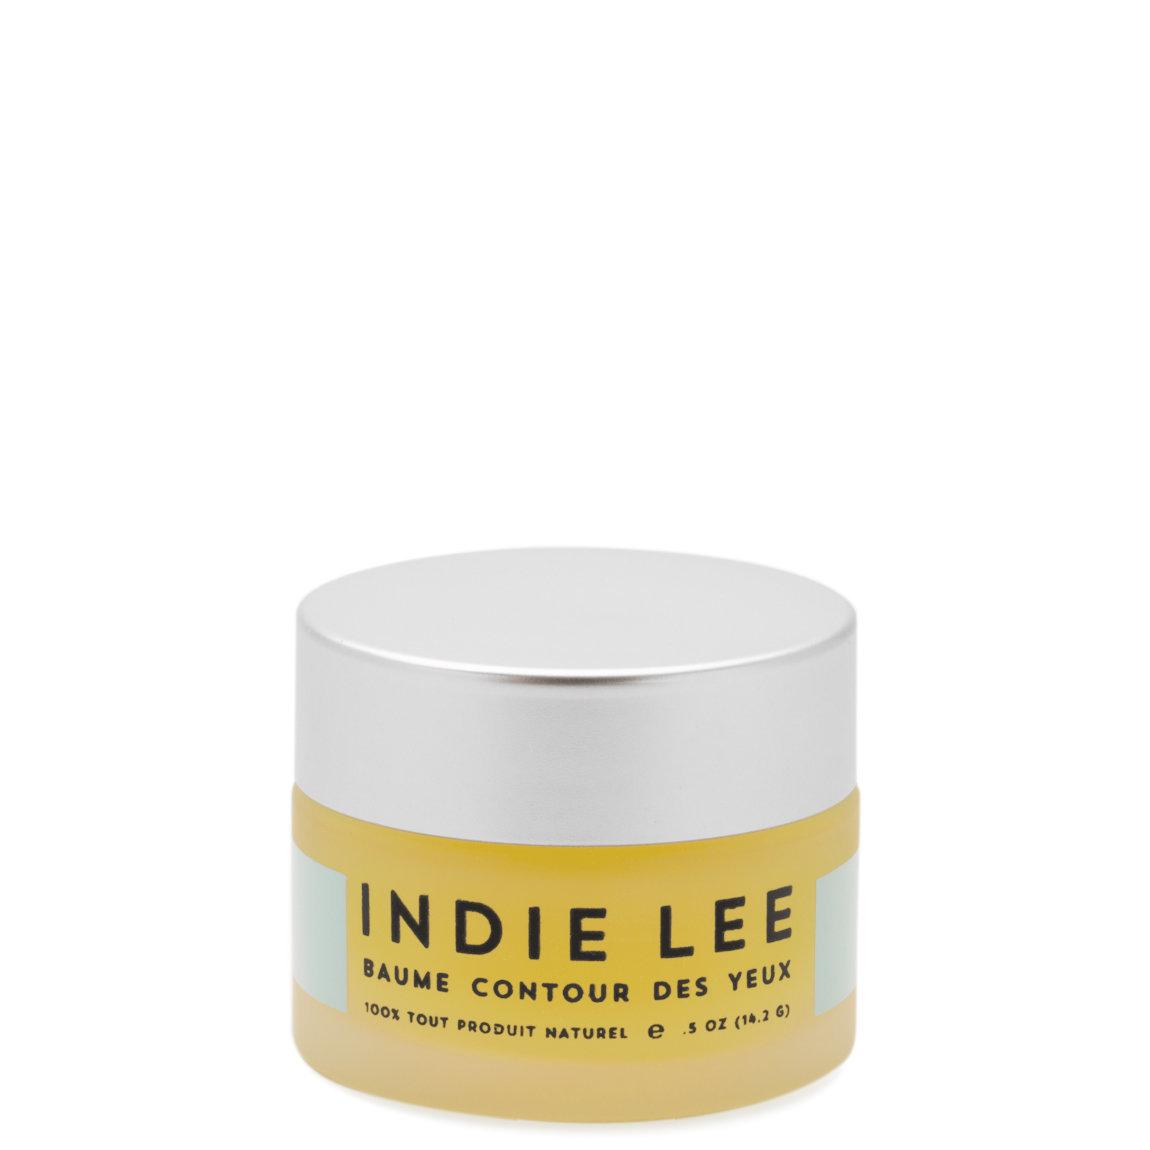 Indie Lee Calendula Eye Balm product swatch.